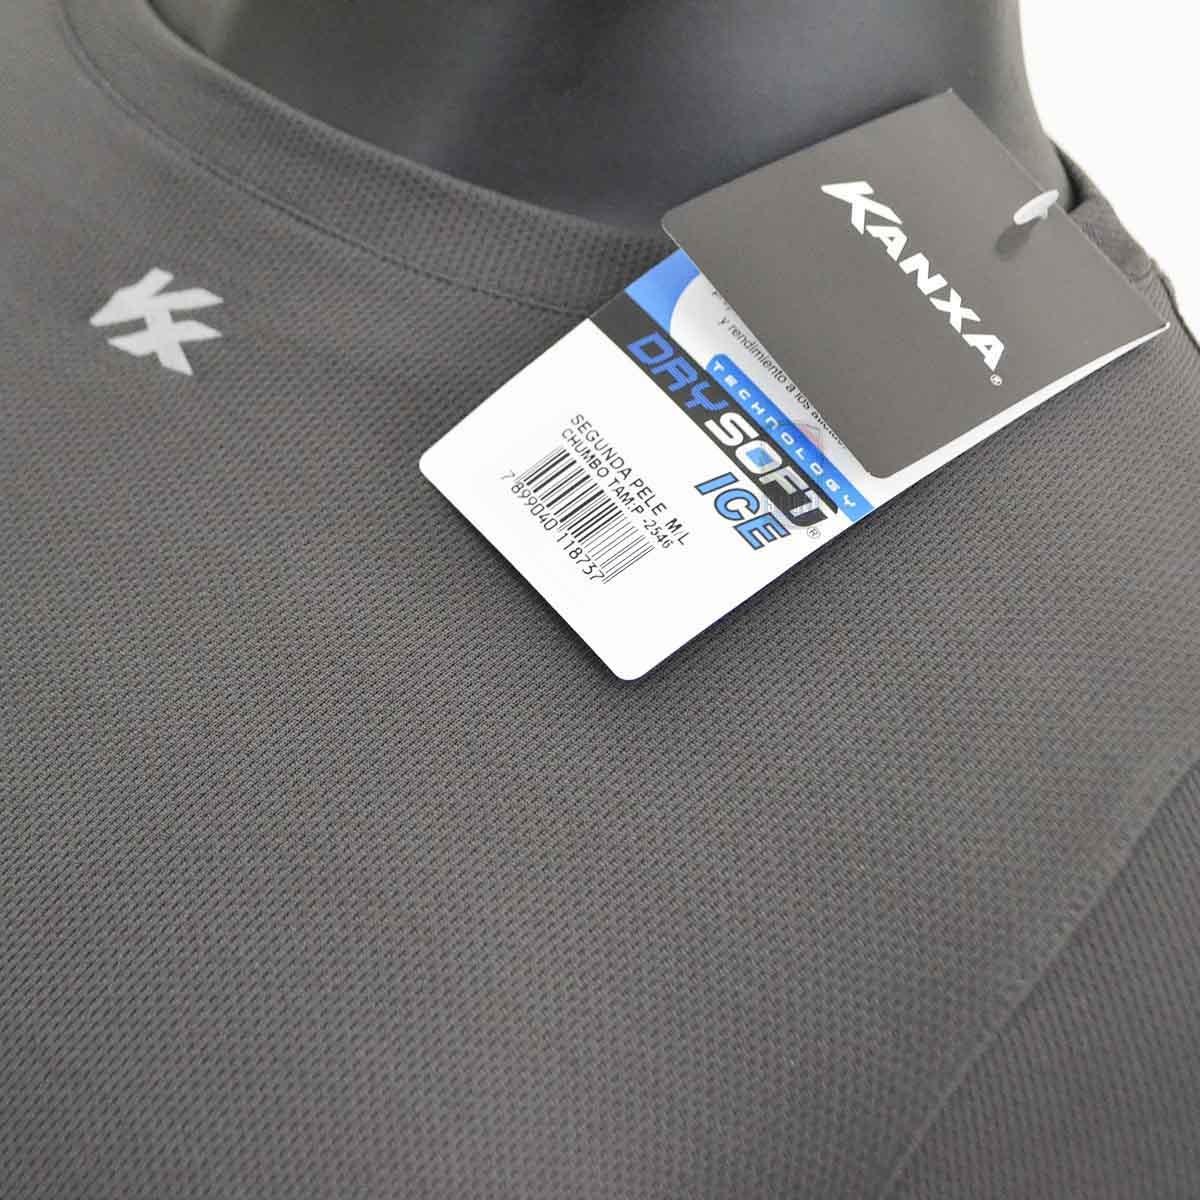 camisa térmica segunda pele kanxa manga longa poliamida c nf. Carregando  zoom... camisa manga longa. Carregando zoom. 955b03725dcf5